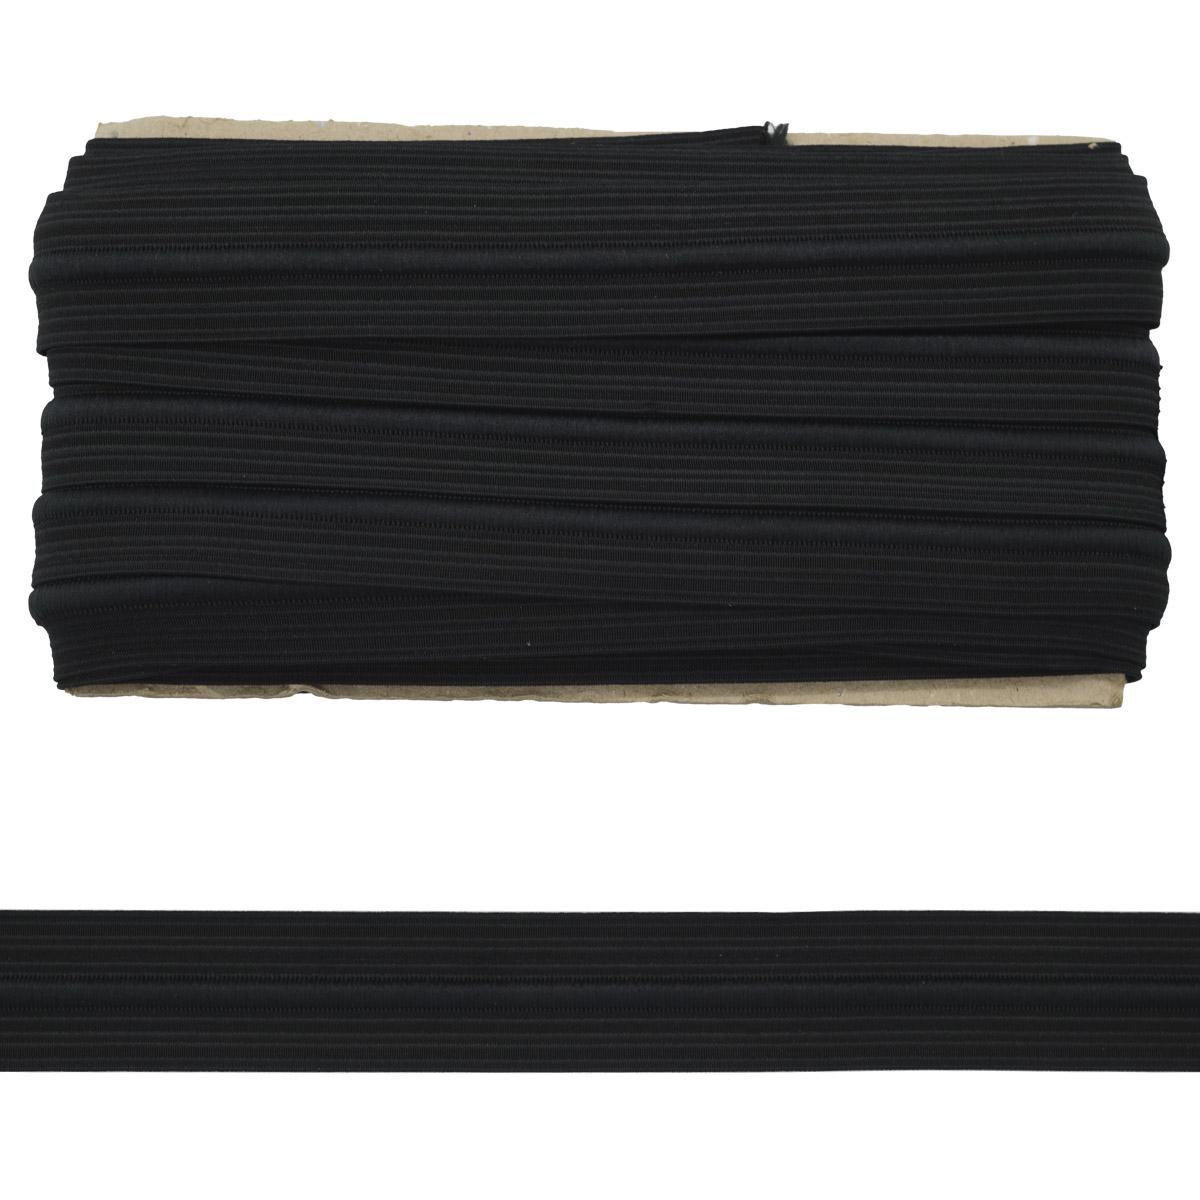 90576Ч Лента эластичная со шнуром 3,5см